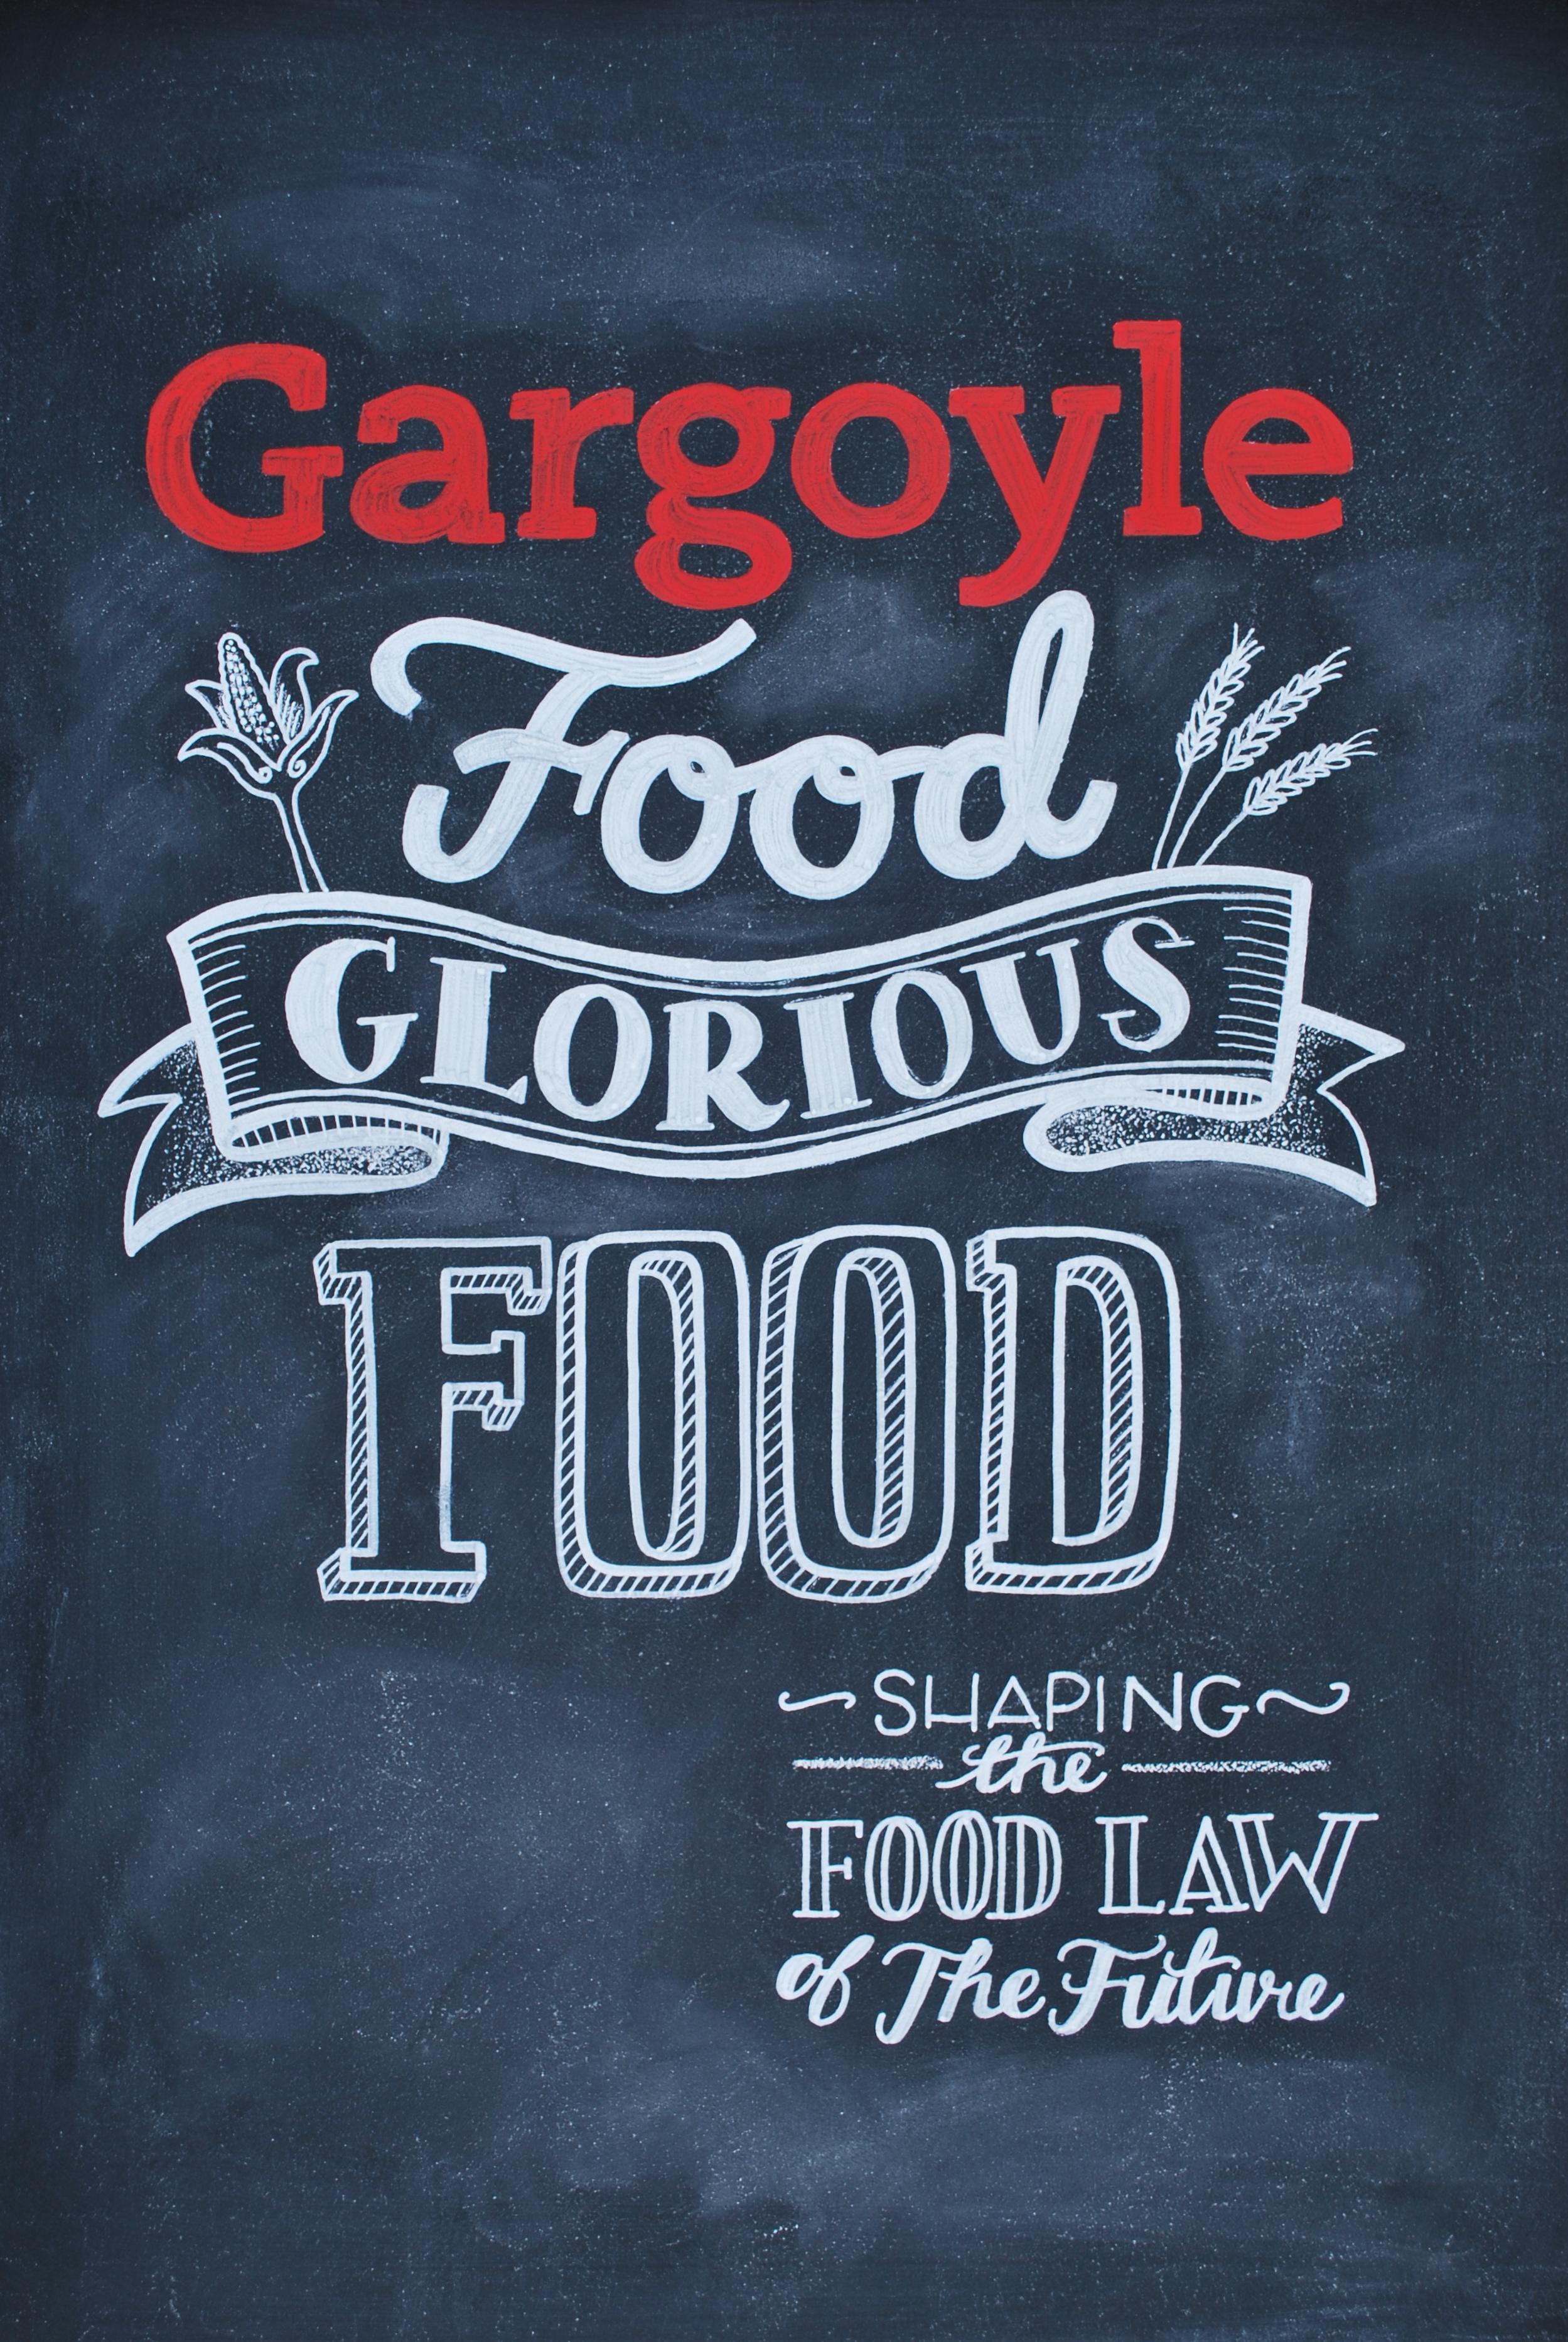 Gargoyle University of Wisconsin Law Magazine Cover Hand lettering Chalkboard.JPG